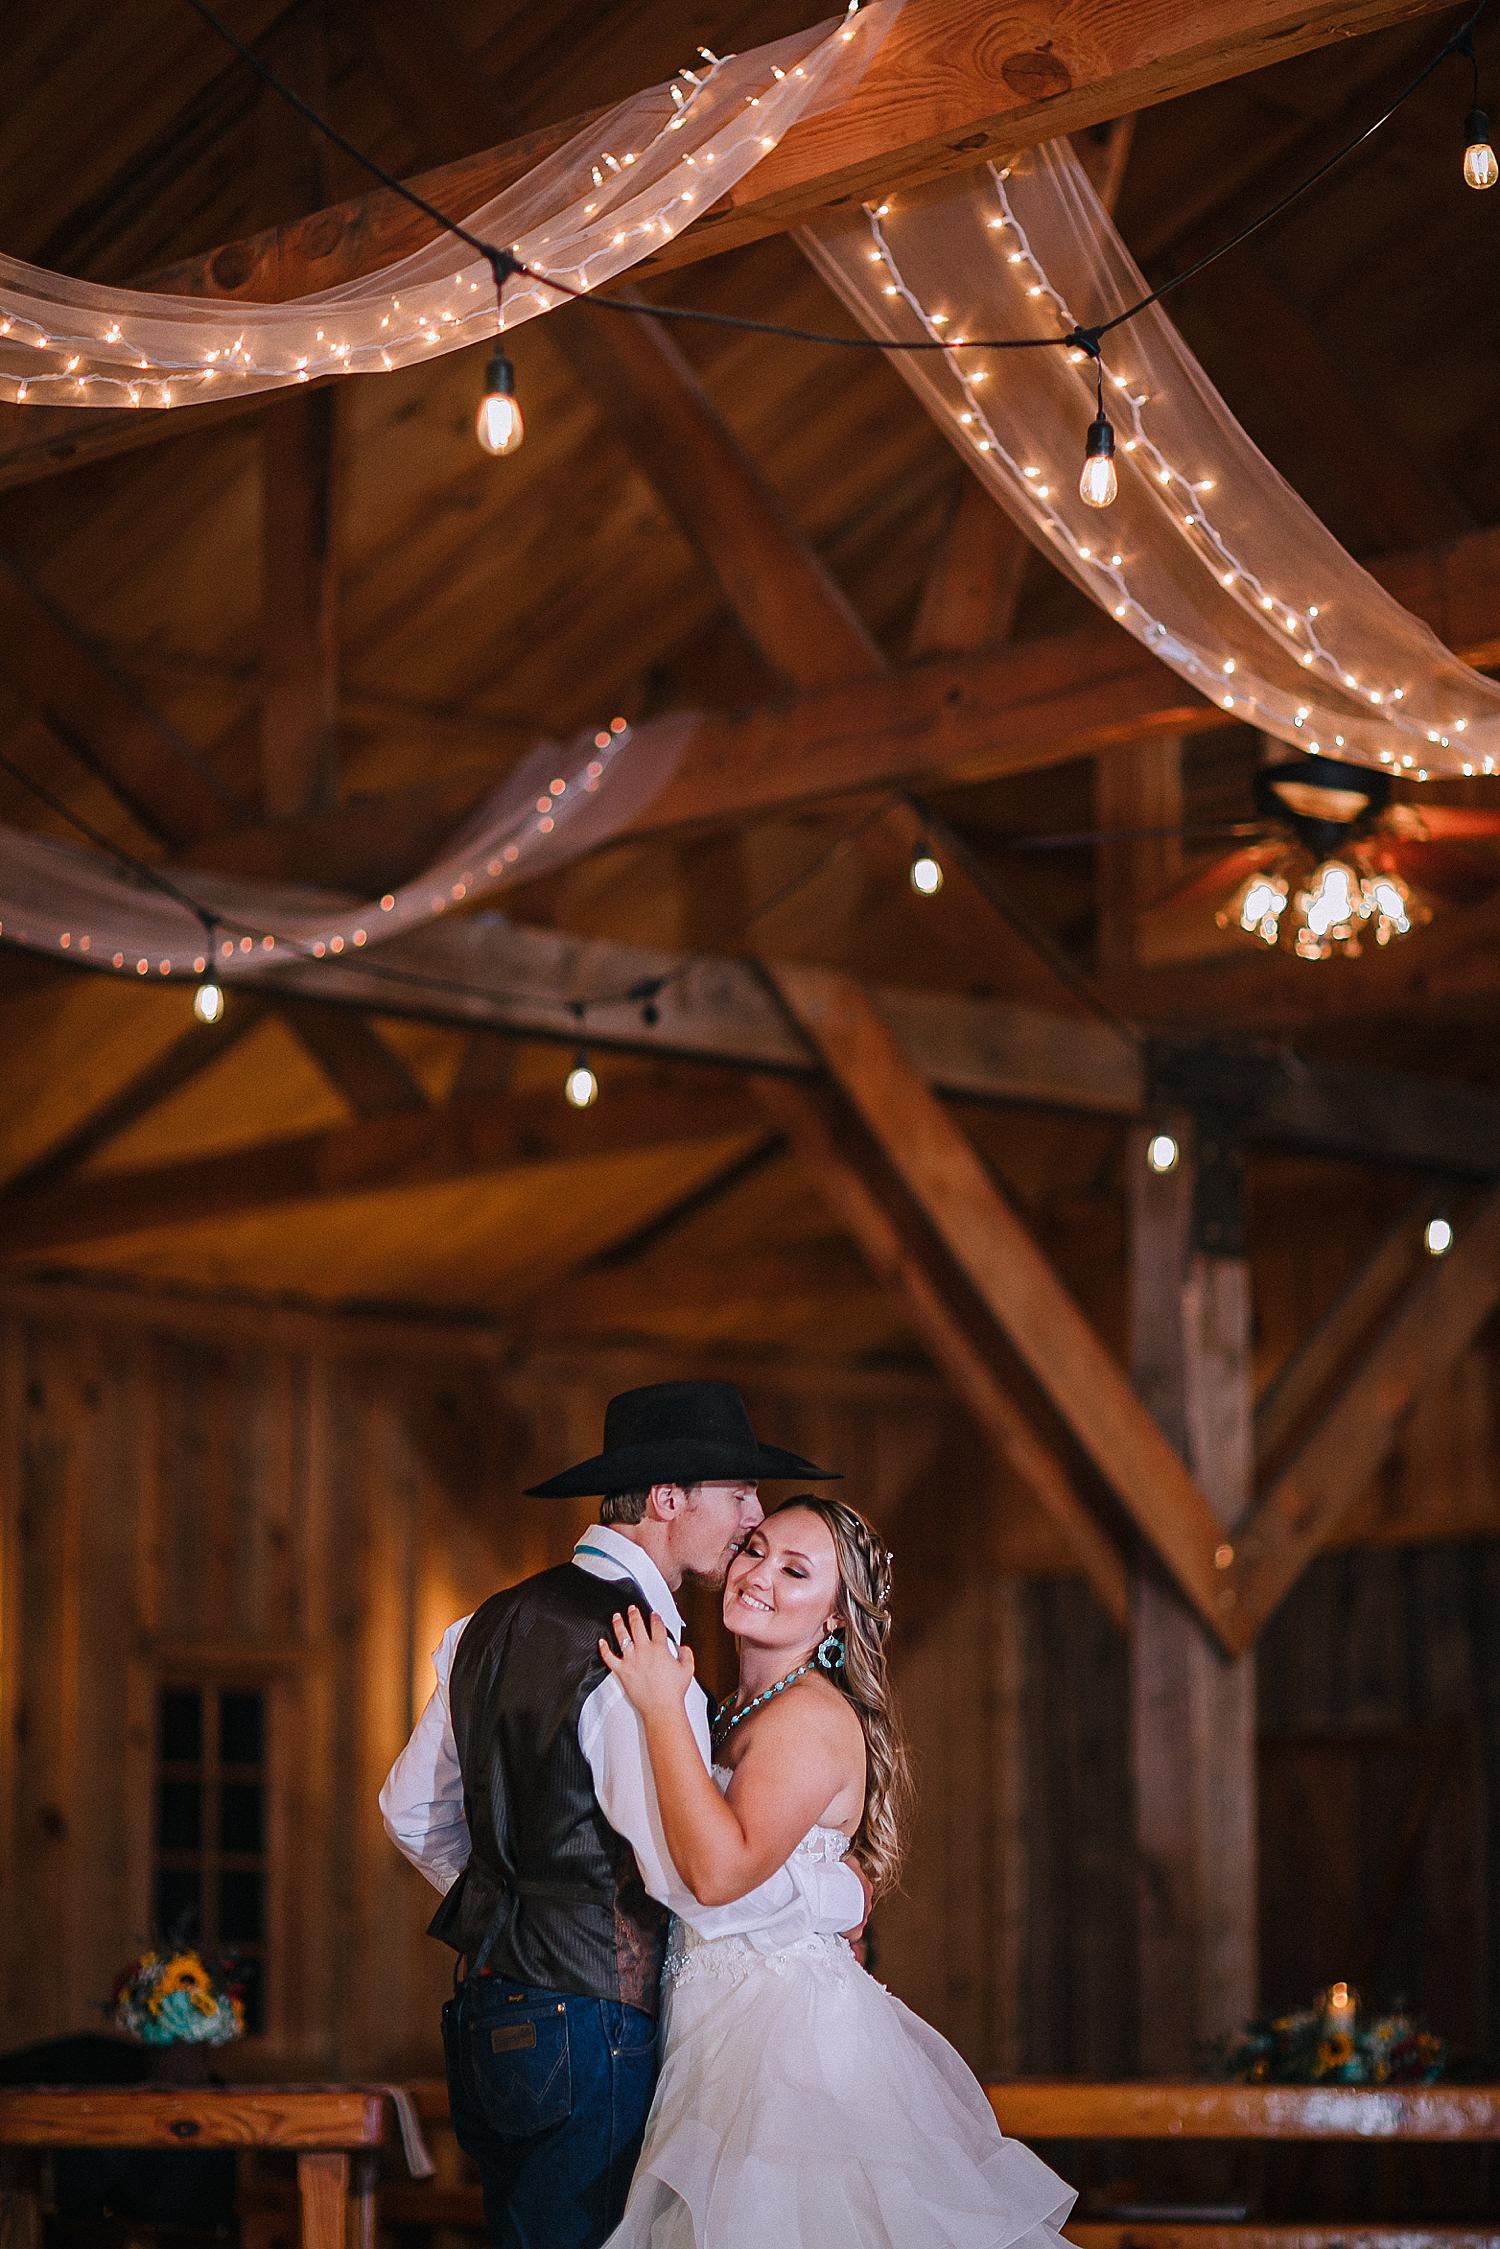 Carly-Barton-Photography-Old-Town-Texas-Rustic-Wedding-Photos-Sunflowers-Boots-Kyle-Texas_0095.jpg